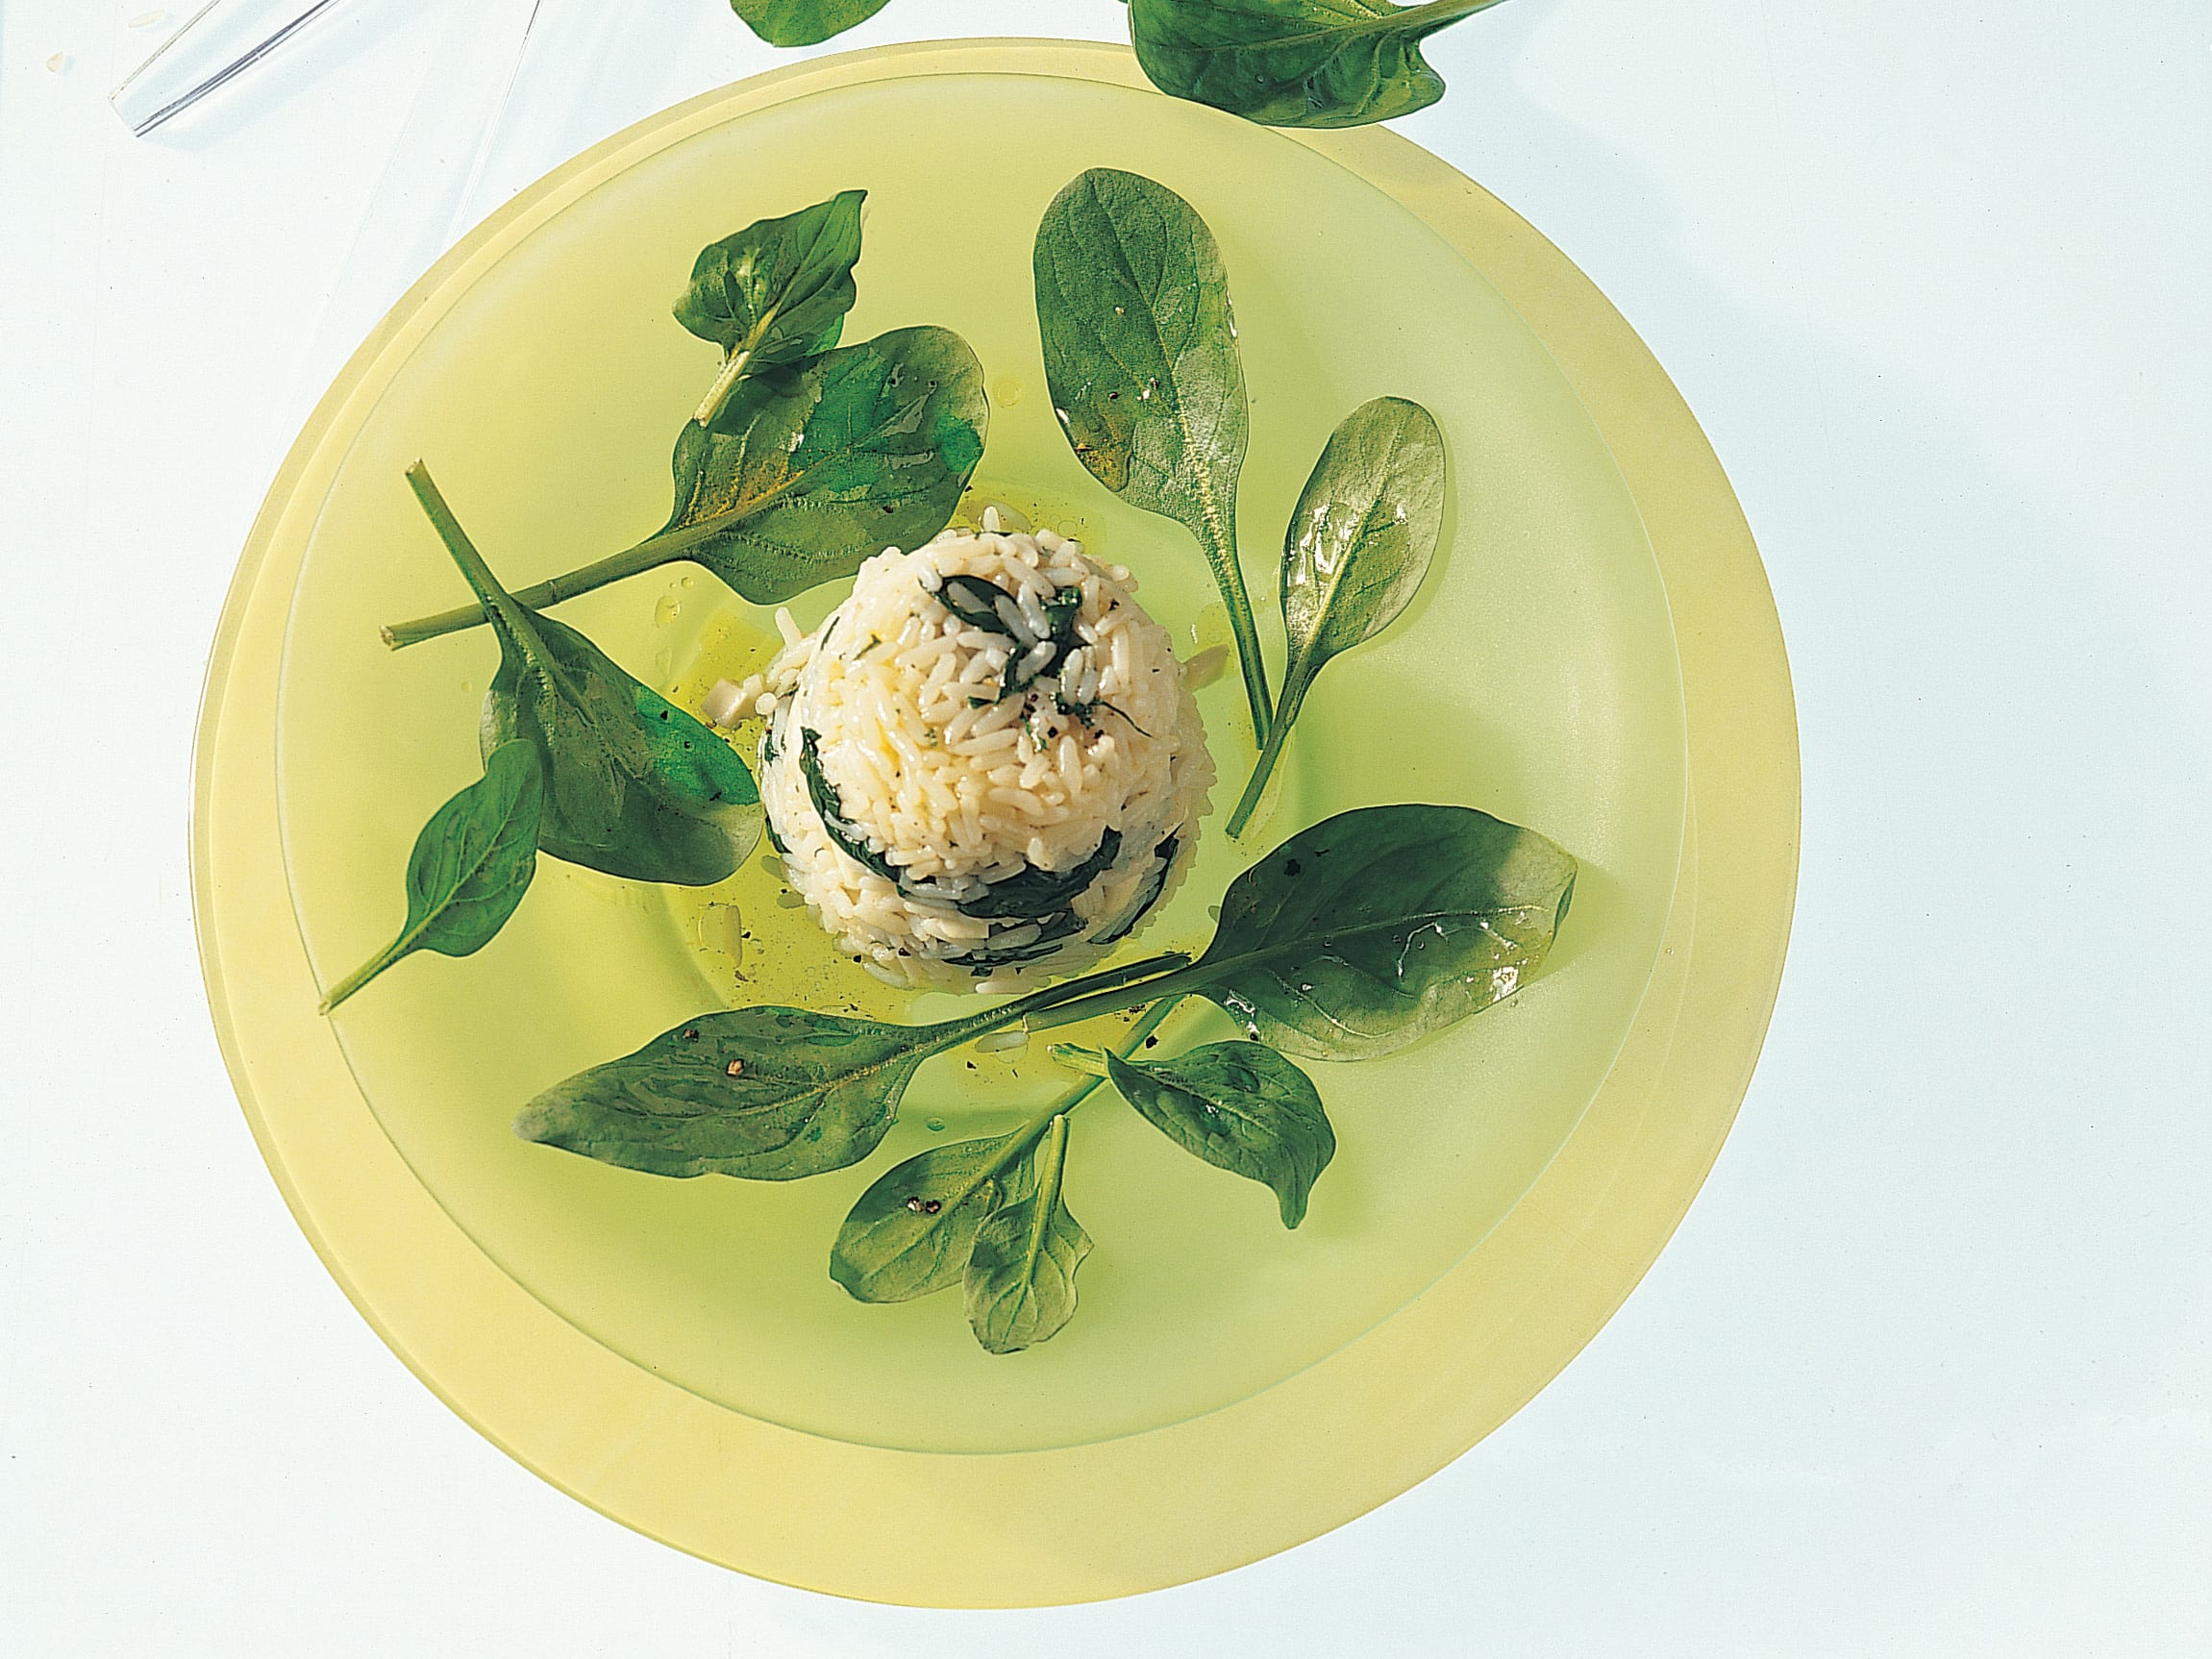 Salade de riz aux épinards